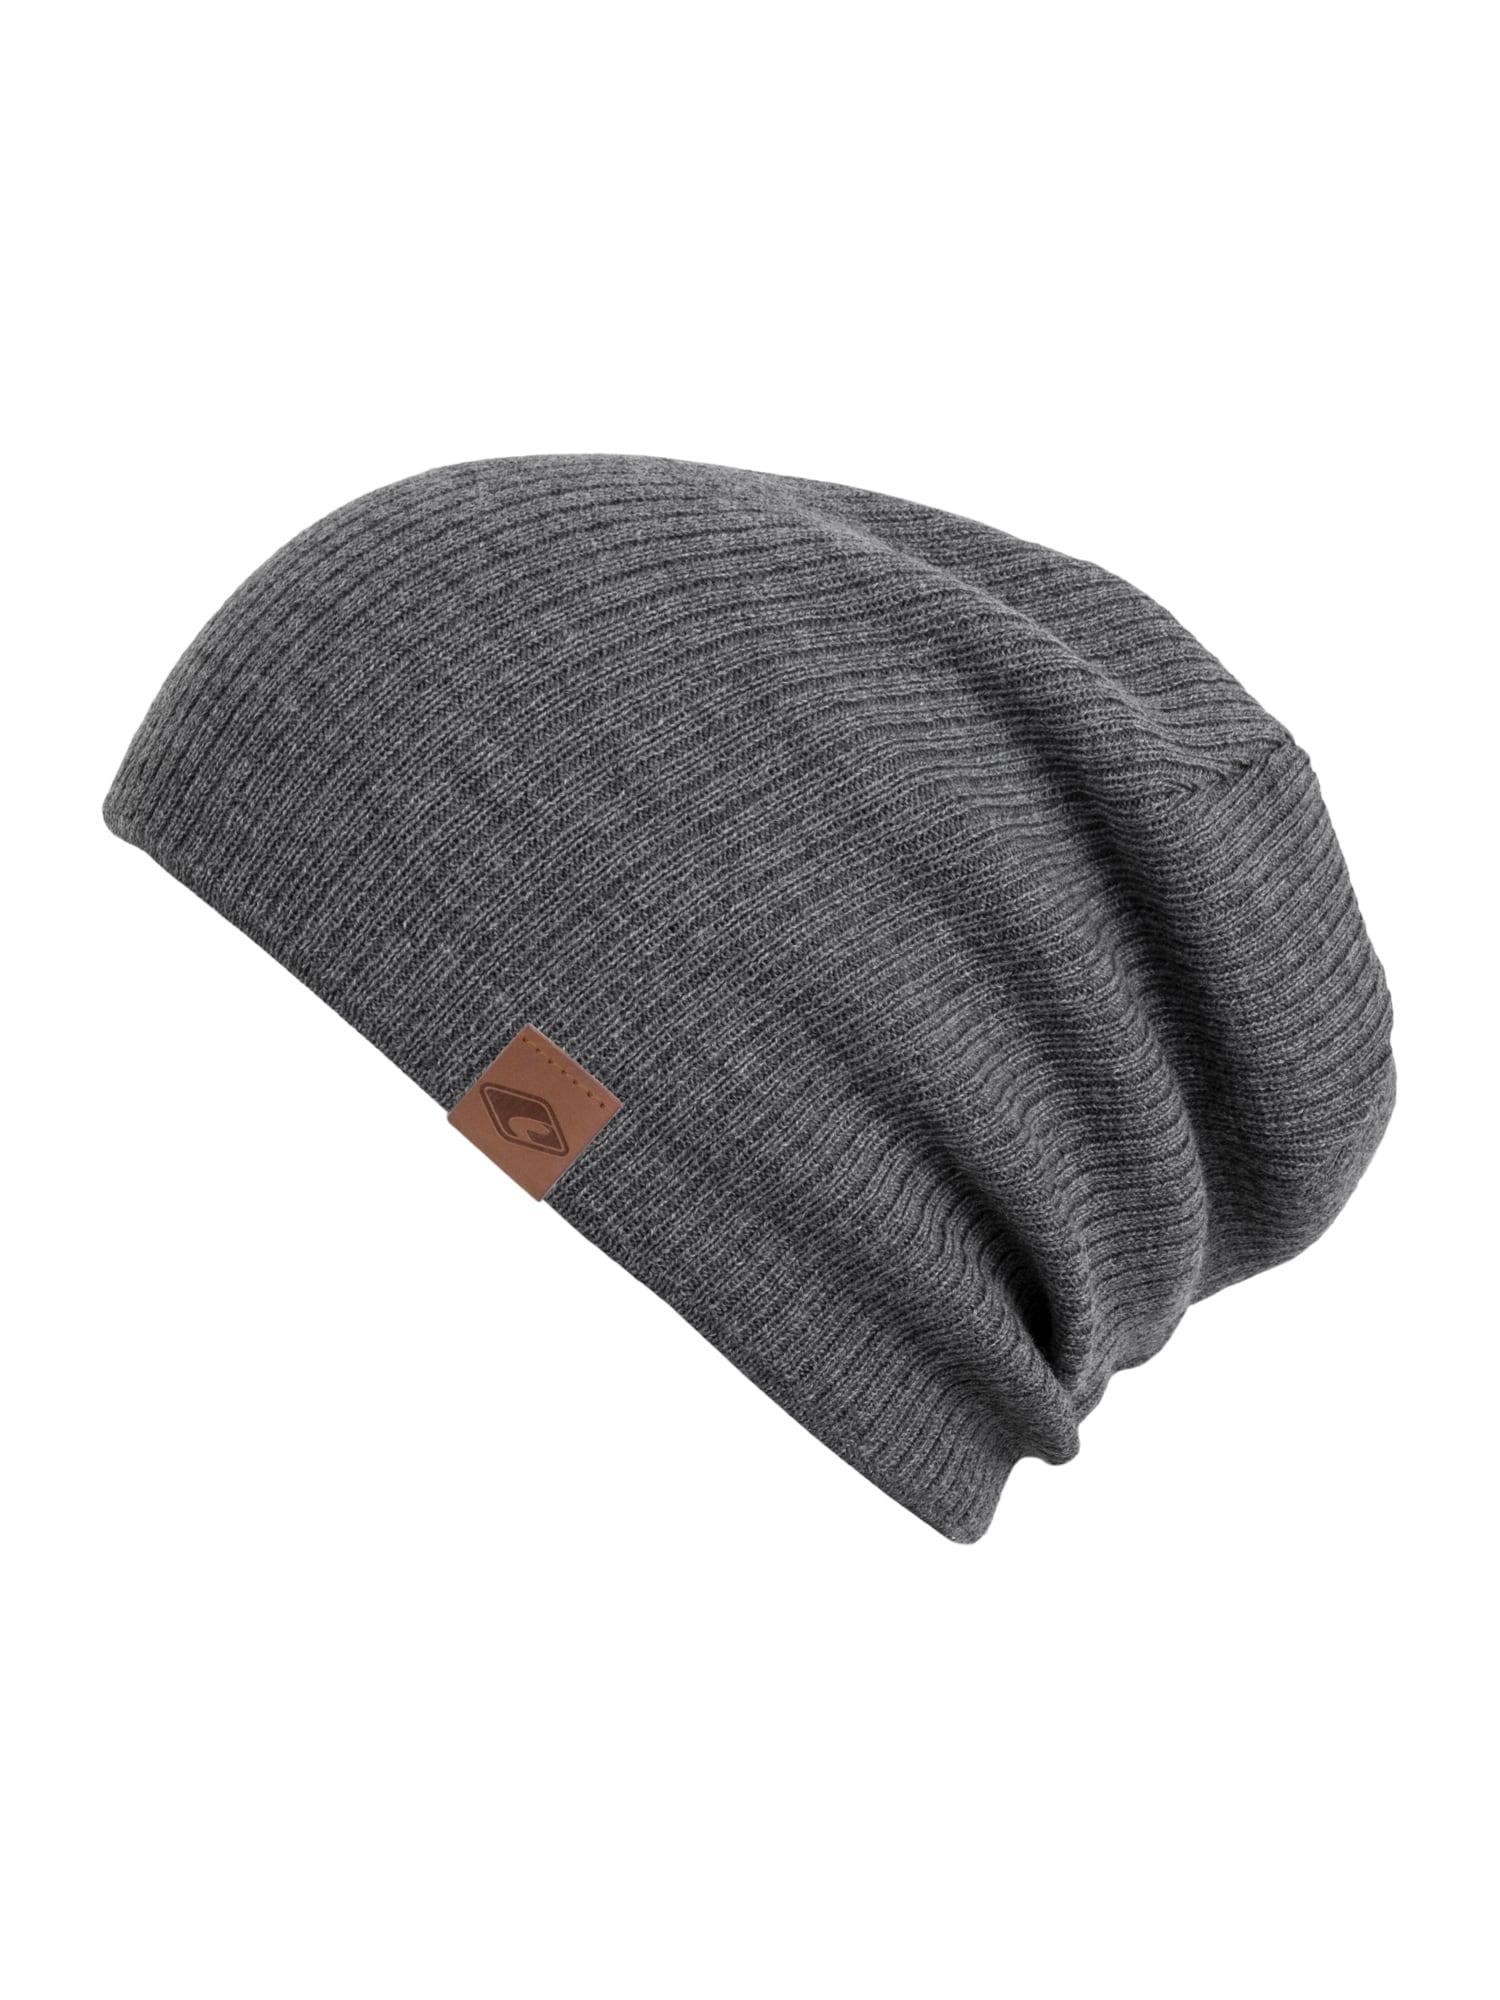 chillouts Megzta kepurė 'Dominik' tamsiai pilka